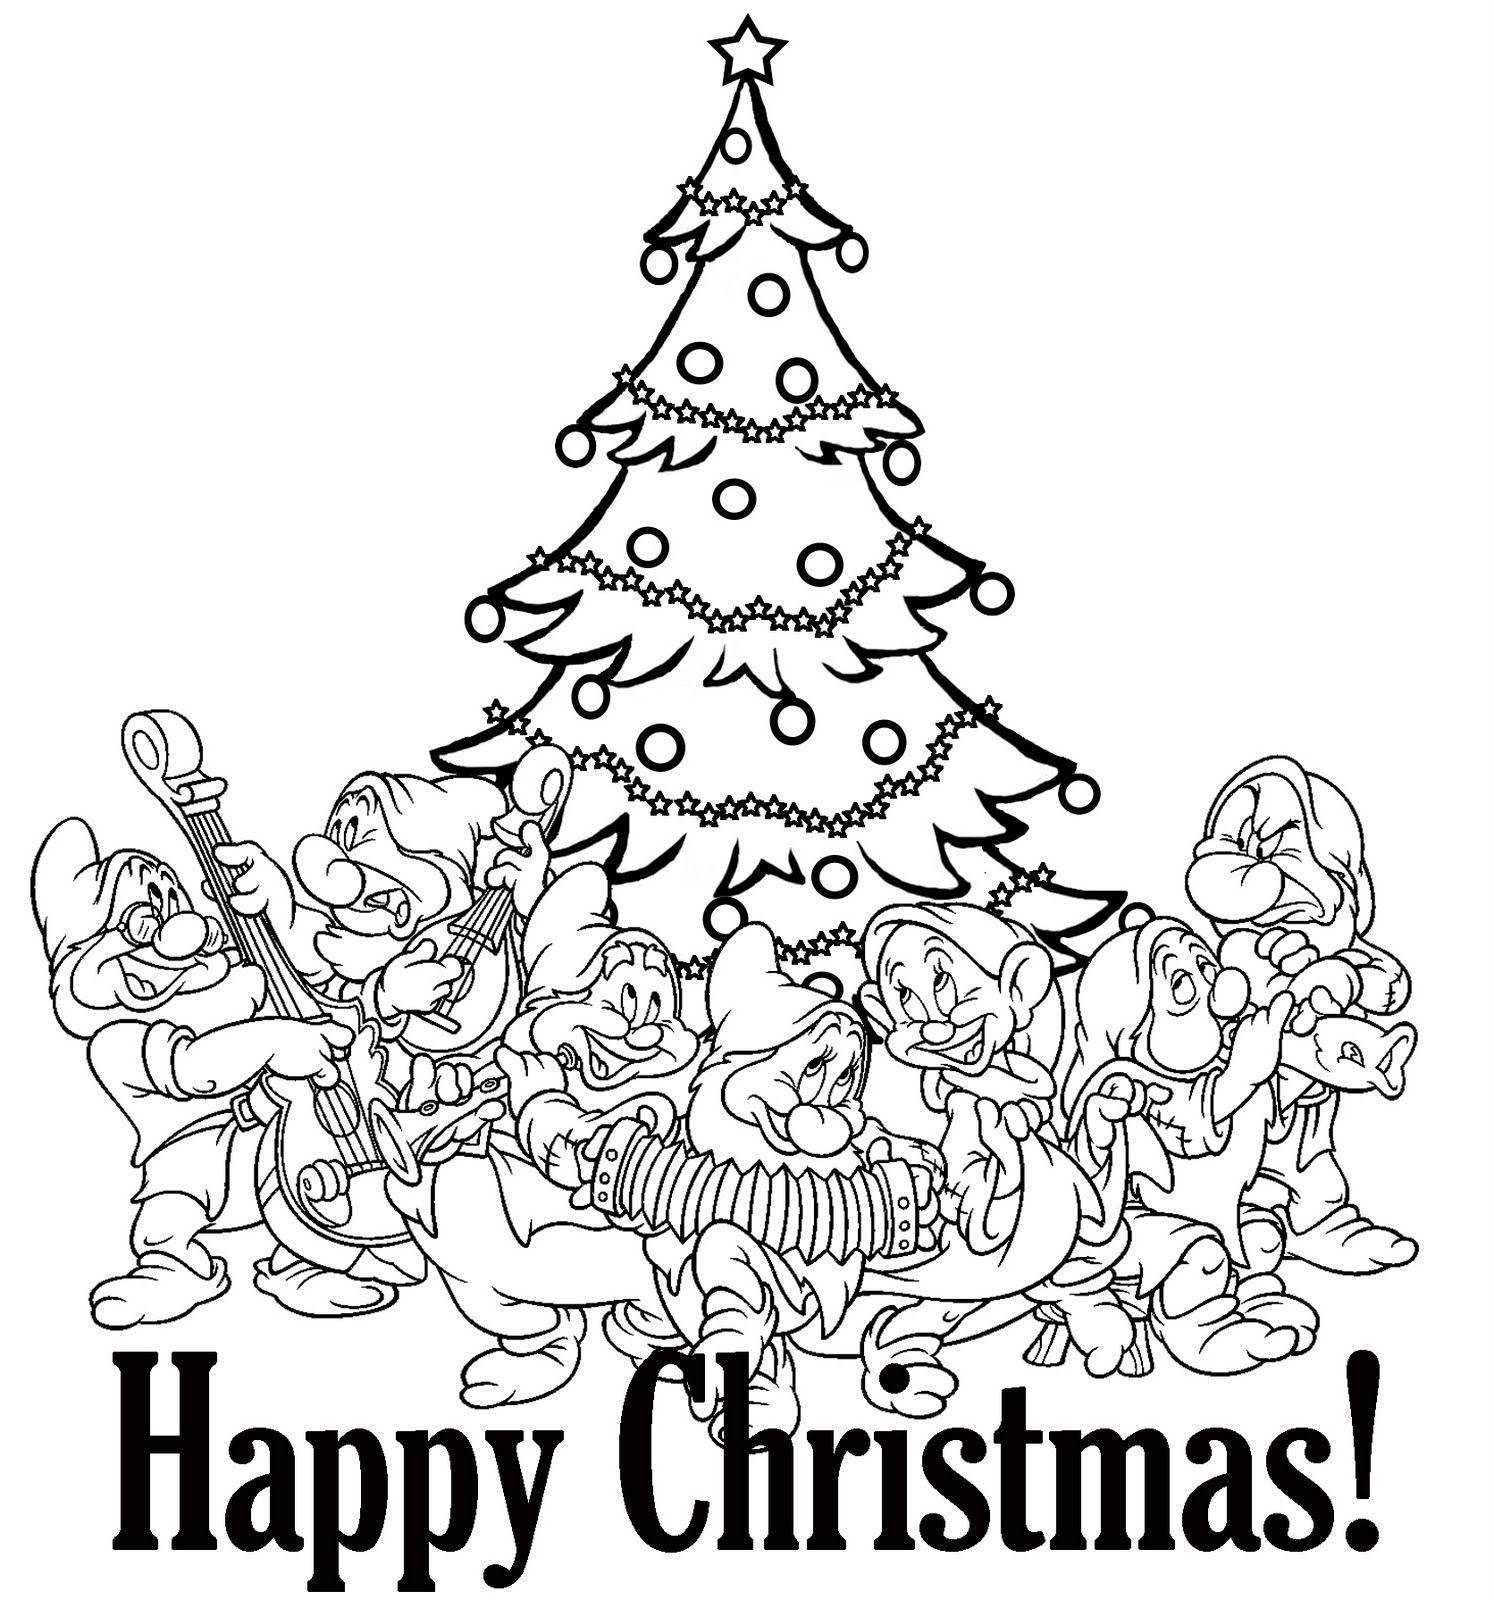 Snow White's seven dwarfs - Disney Christmas coloring page ...